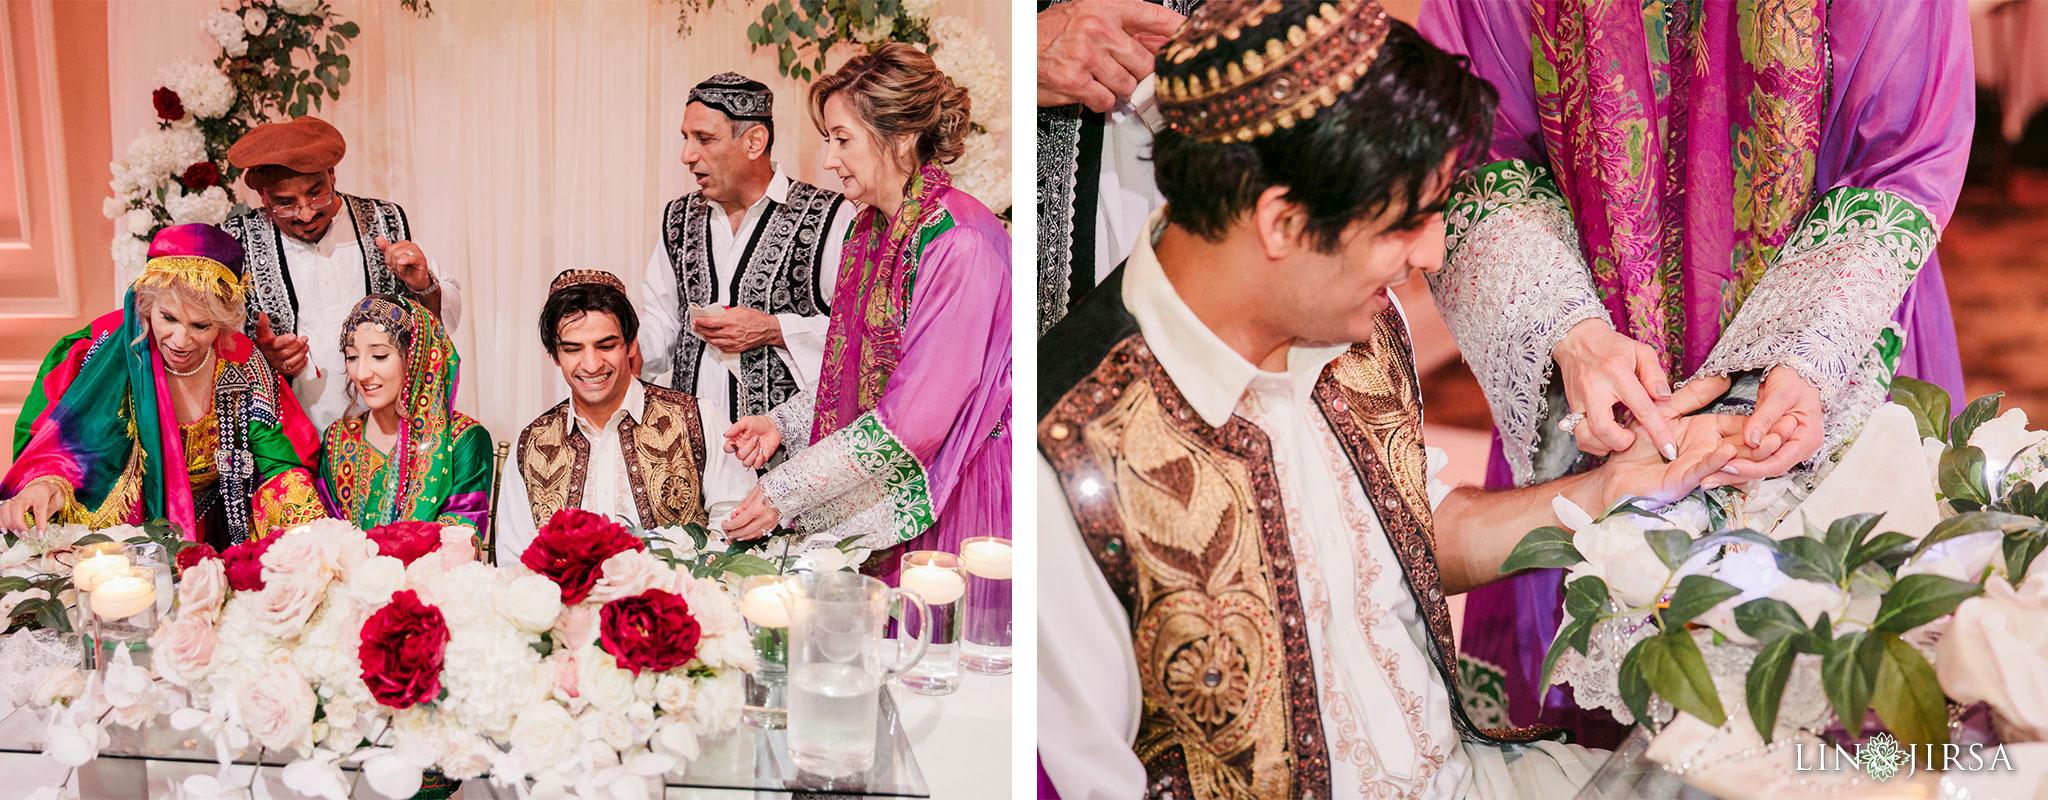 030 taglyan complex los angeles persian wedding photography